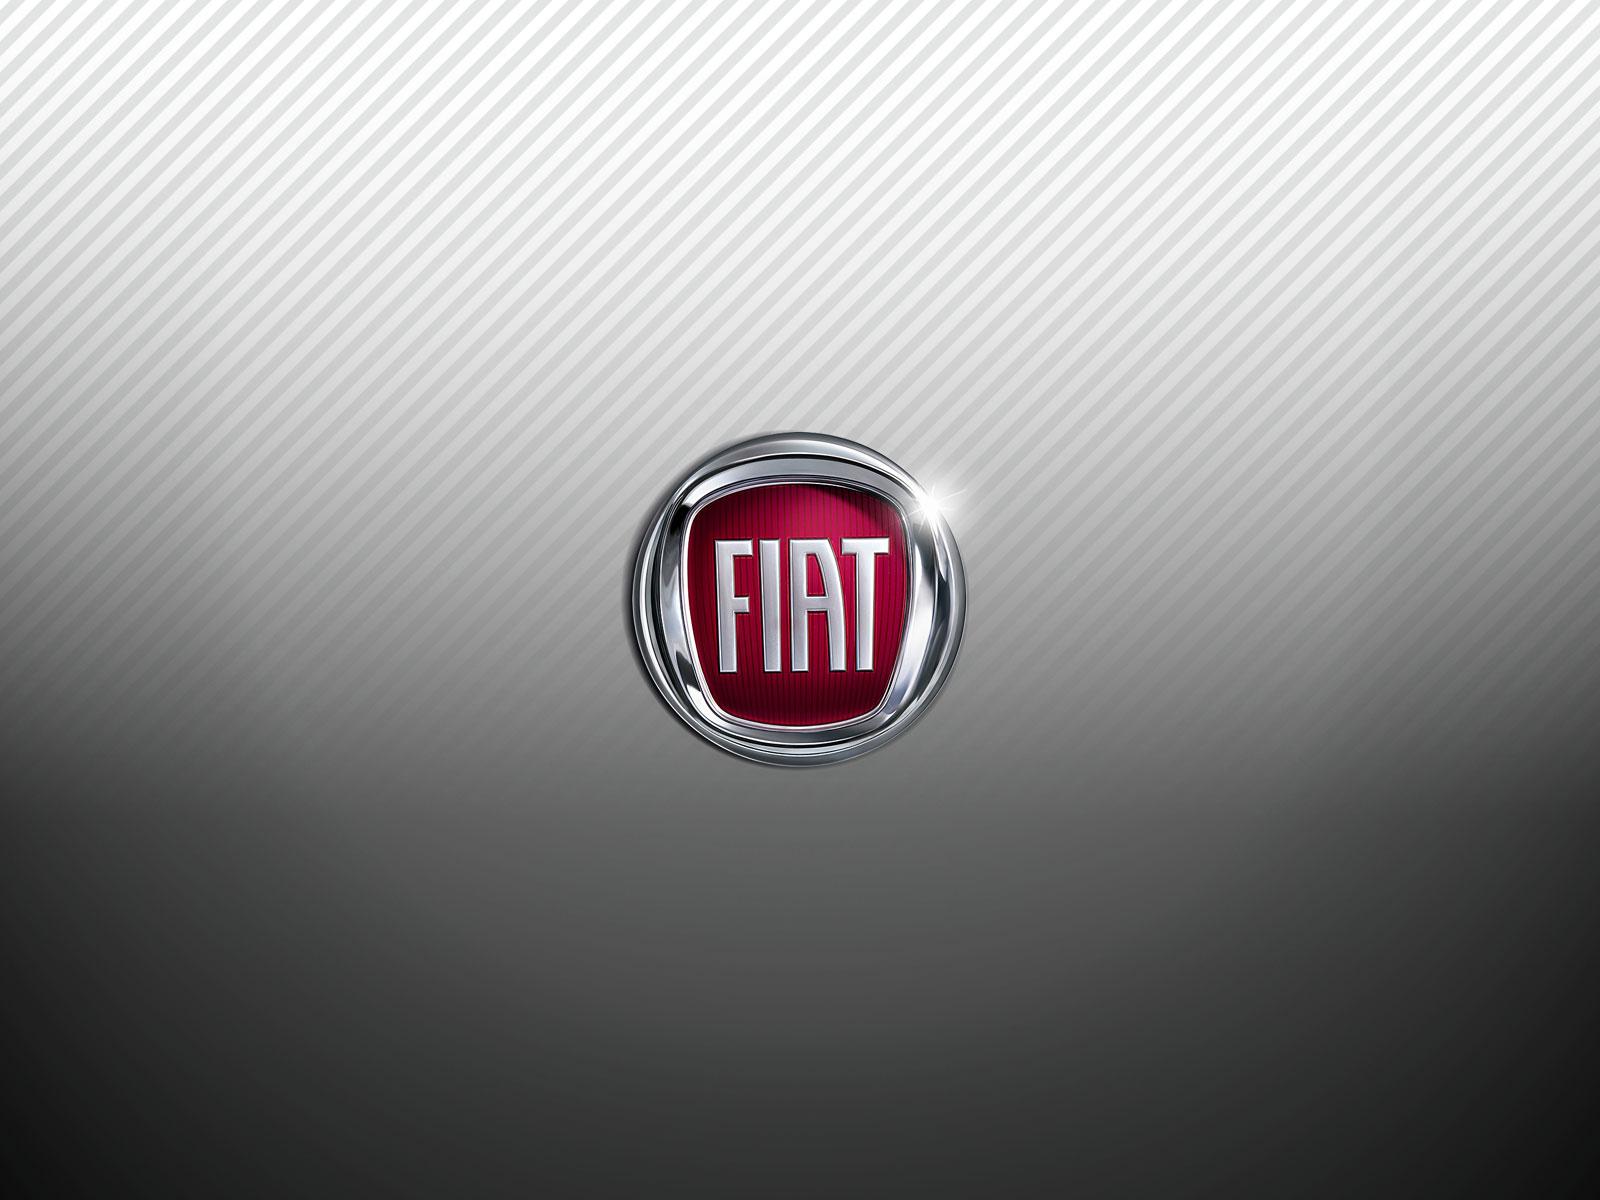 Fiat Logo Wallpaper 37456 1600x1200px 1600x1200